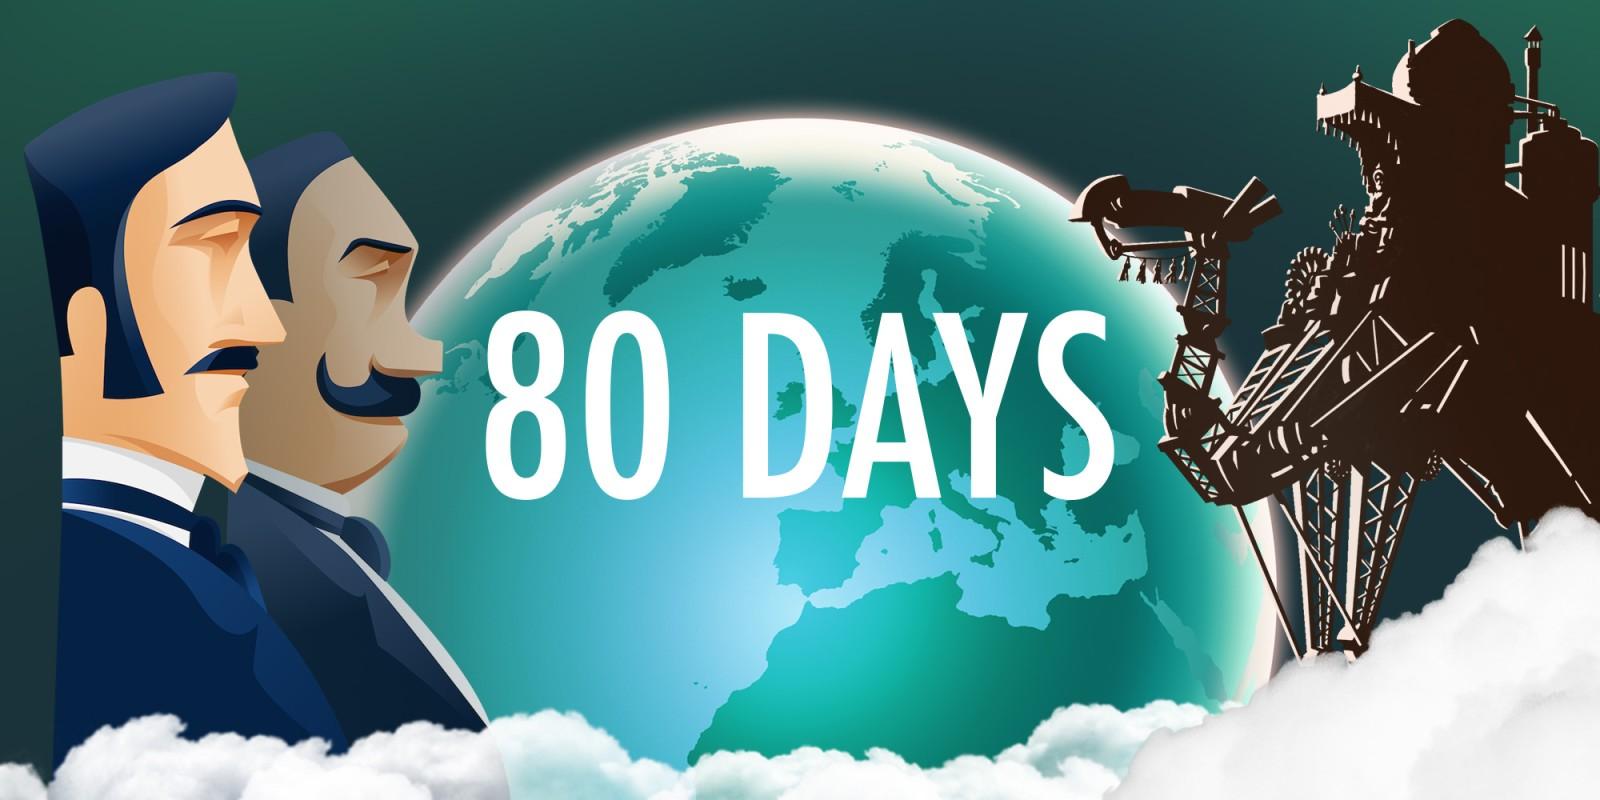 80 DAYS | Nintendo Switch download software | Games | Nintendo